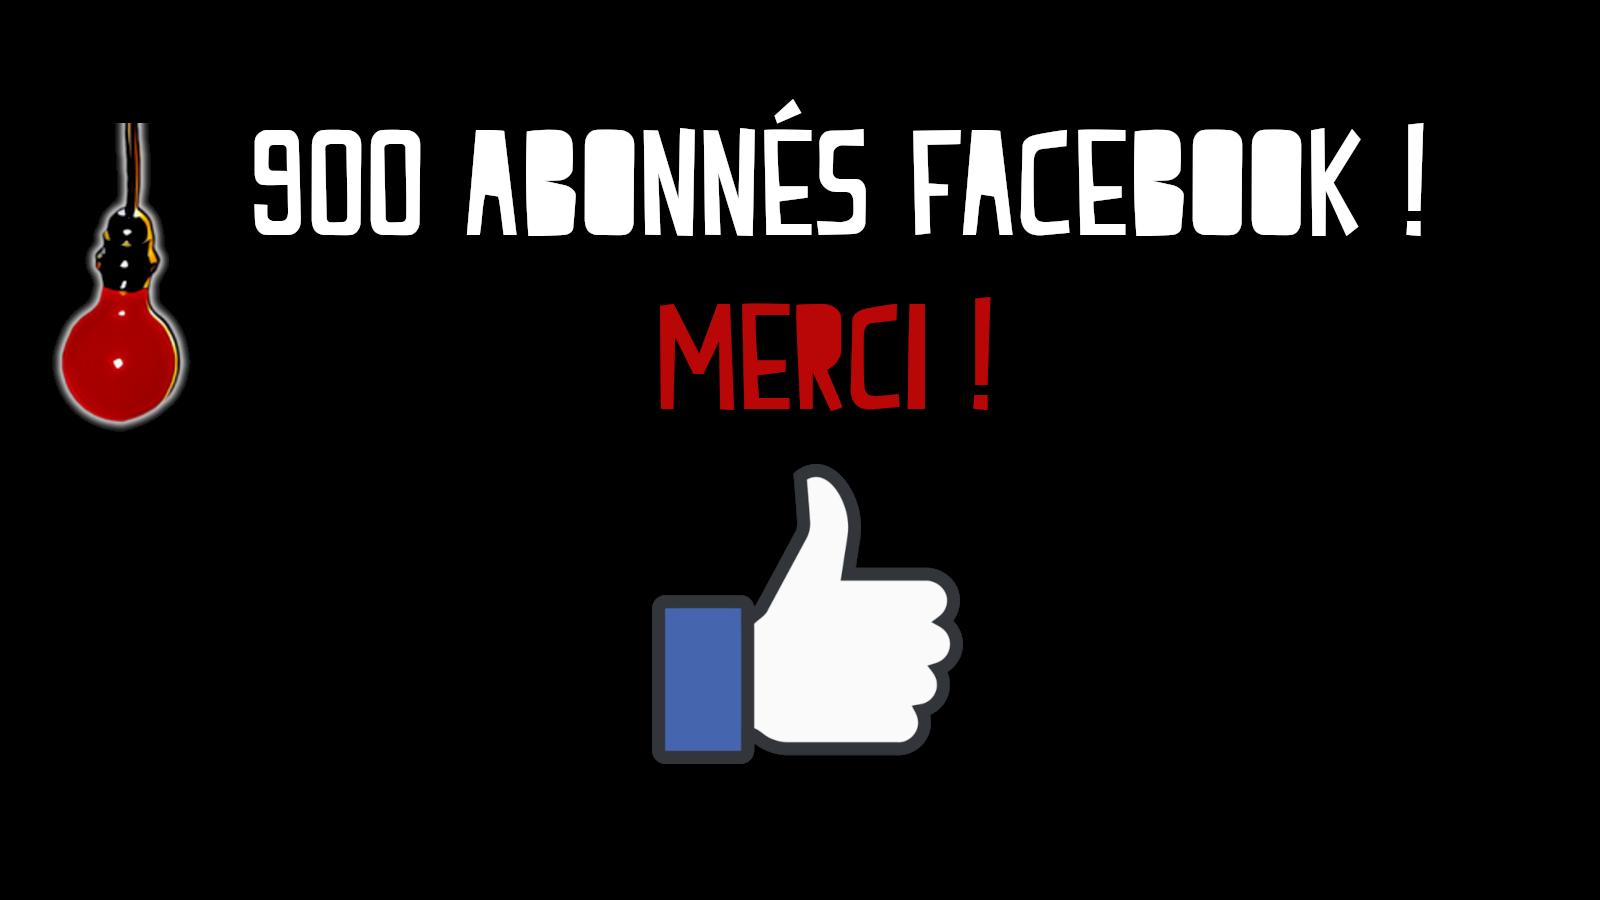 LEON NEIMAD : 900 abonnés Facebook